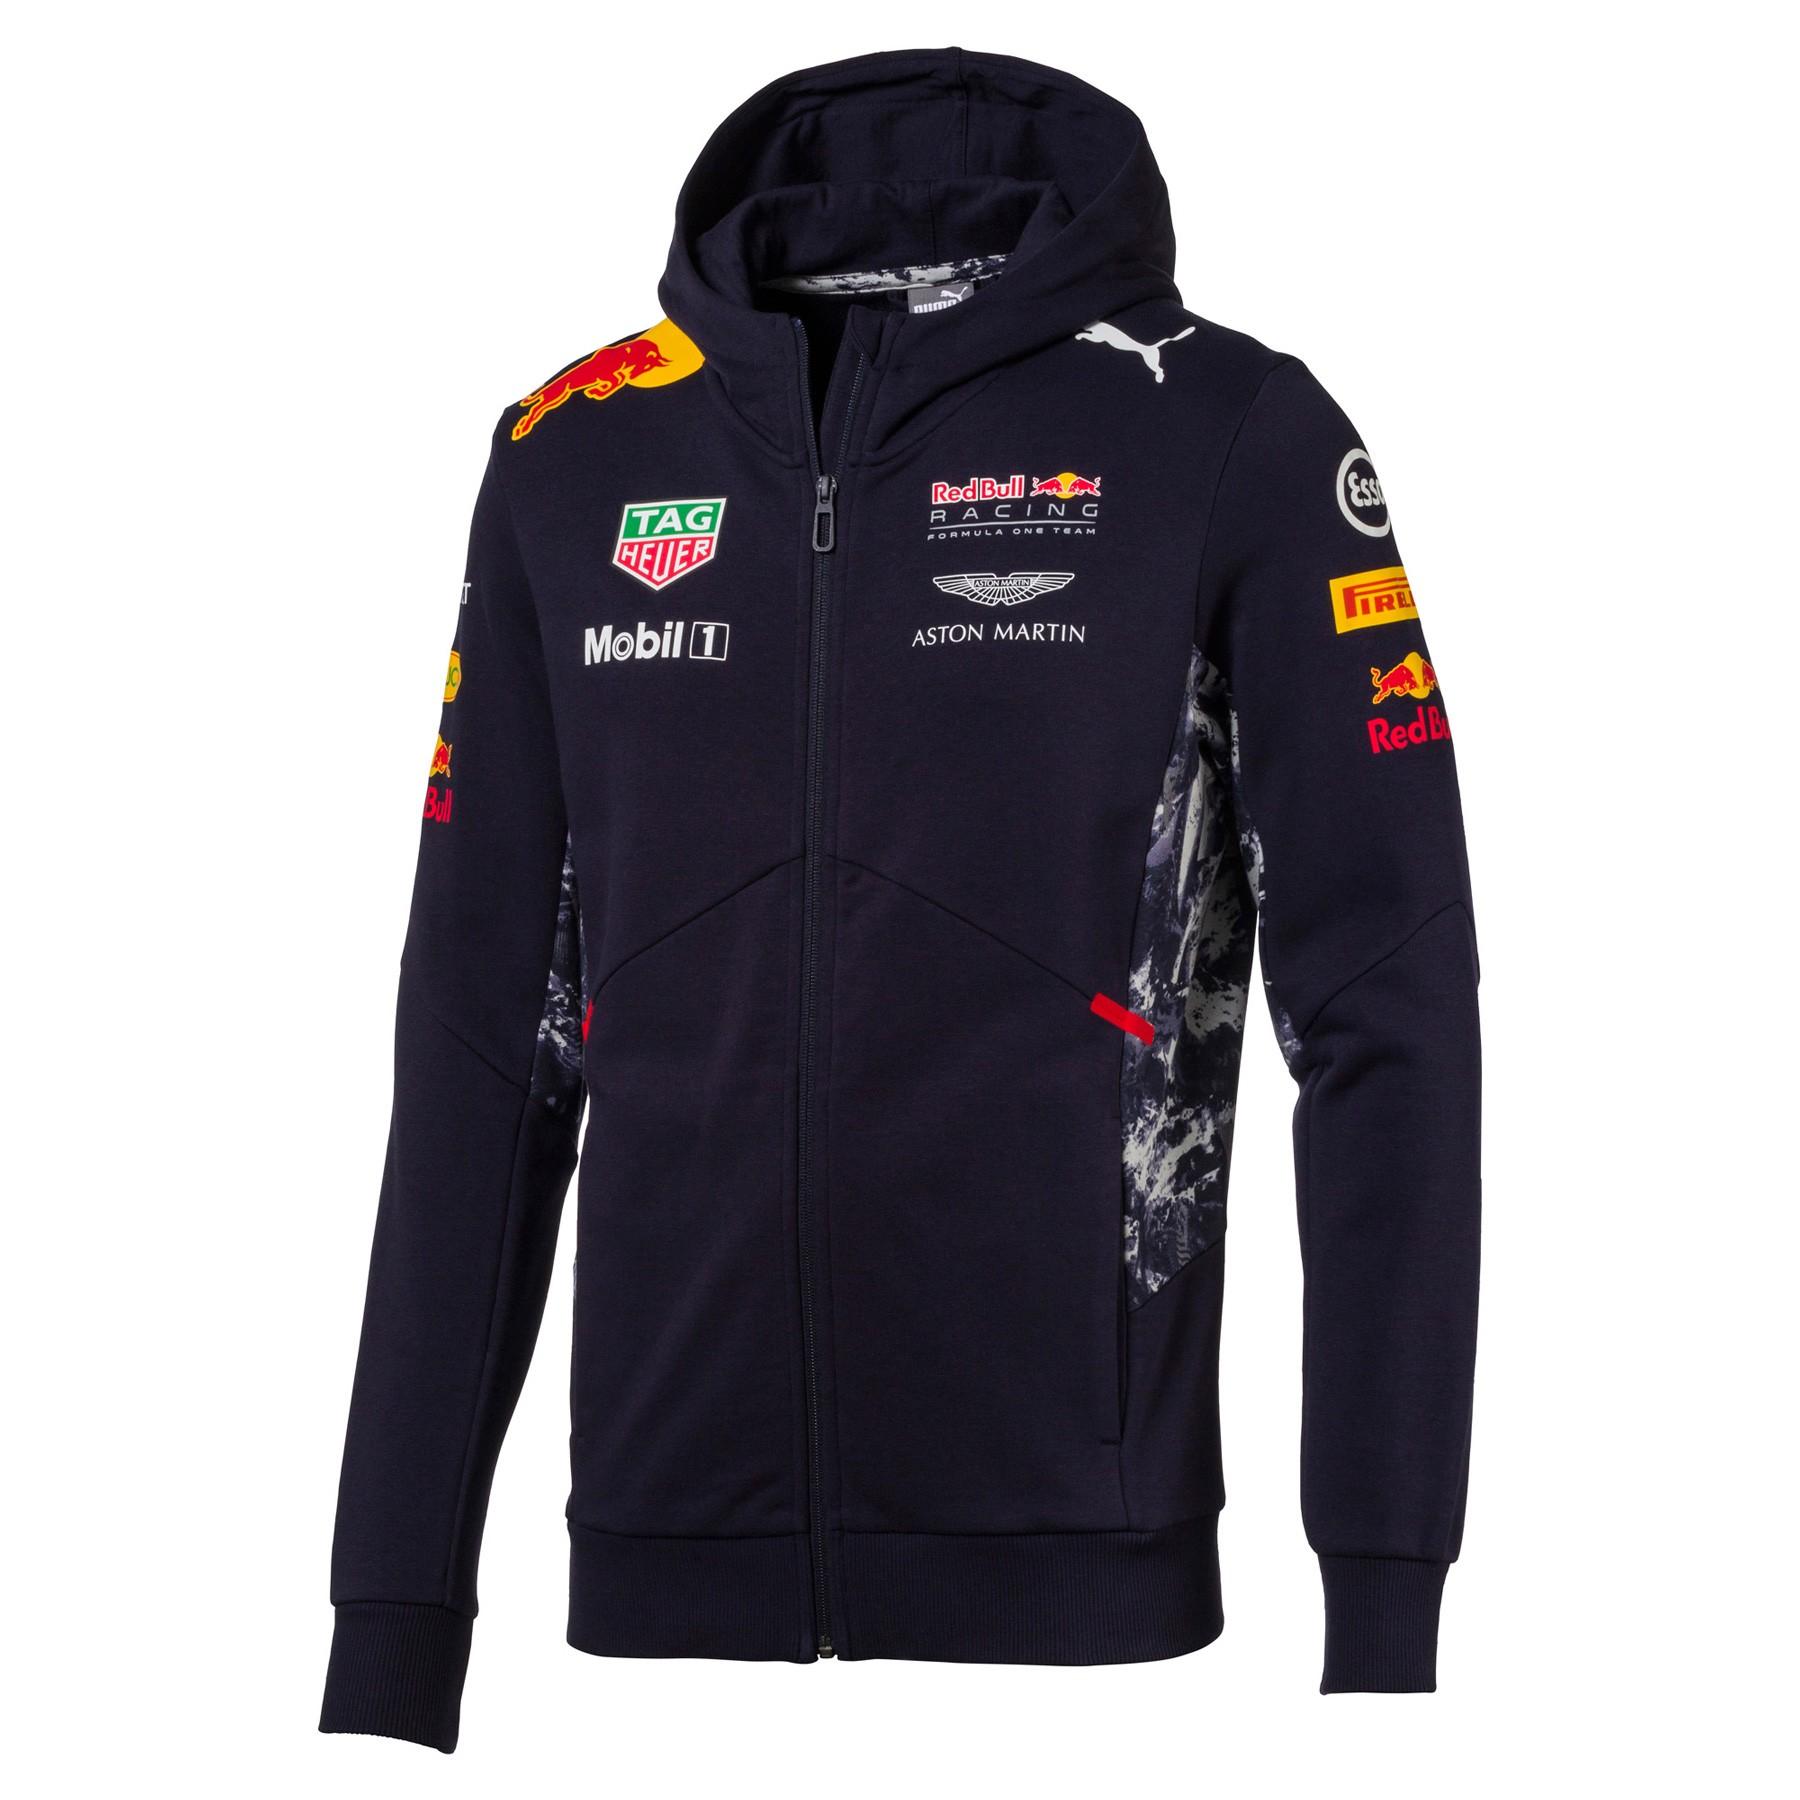 Red Bull Racing Team Hooded Sweat Jacket